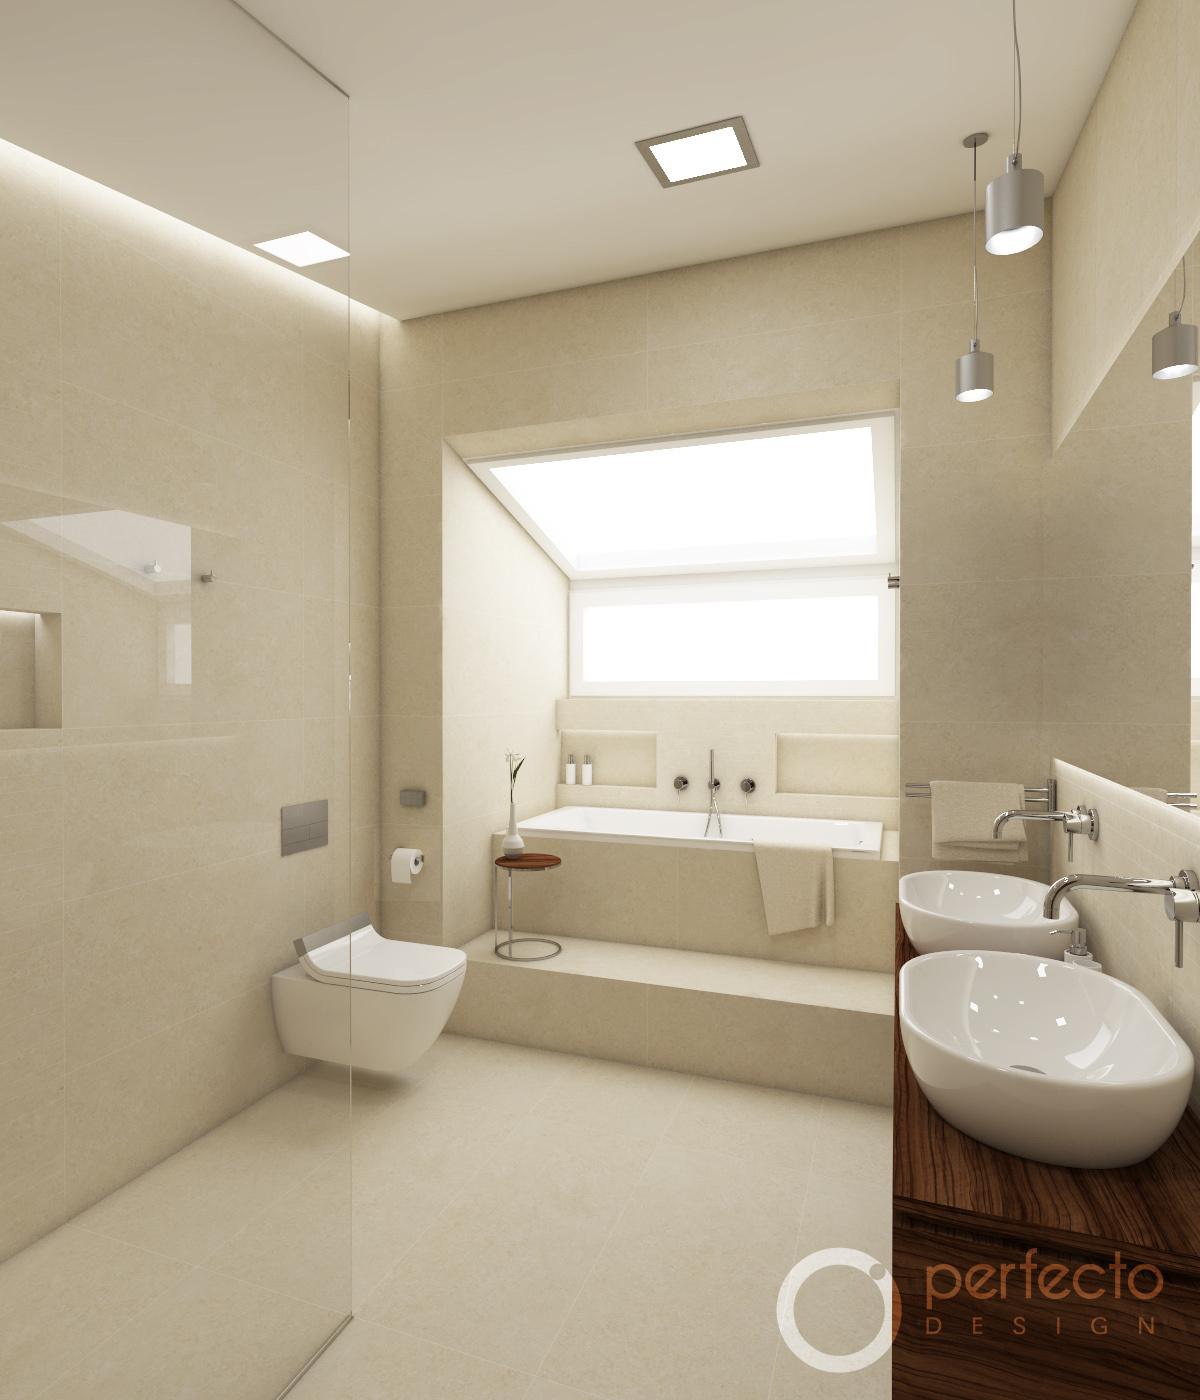 modernes badezimmer savona perfecto design. Black Bedroom Furniture Sets. Home Design Ideas